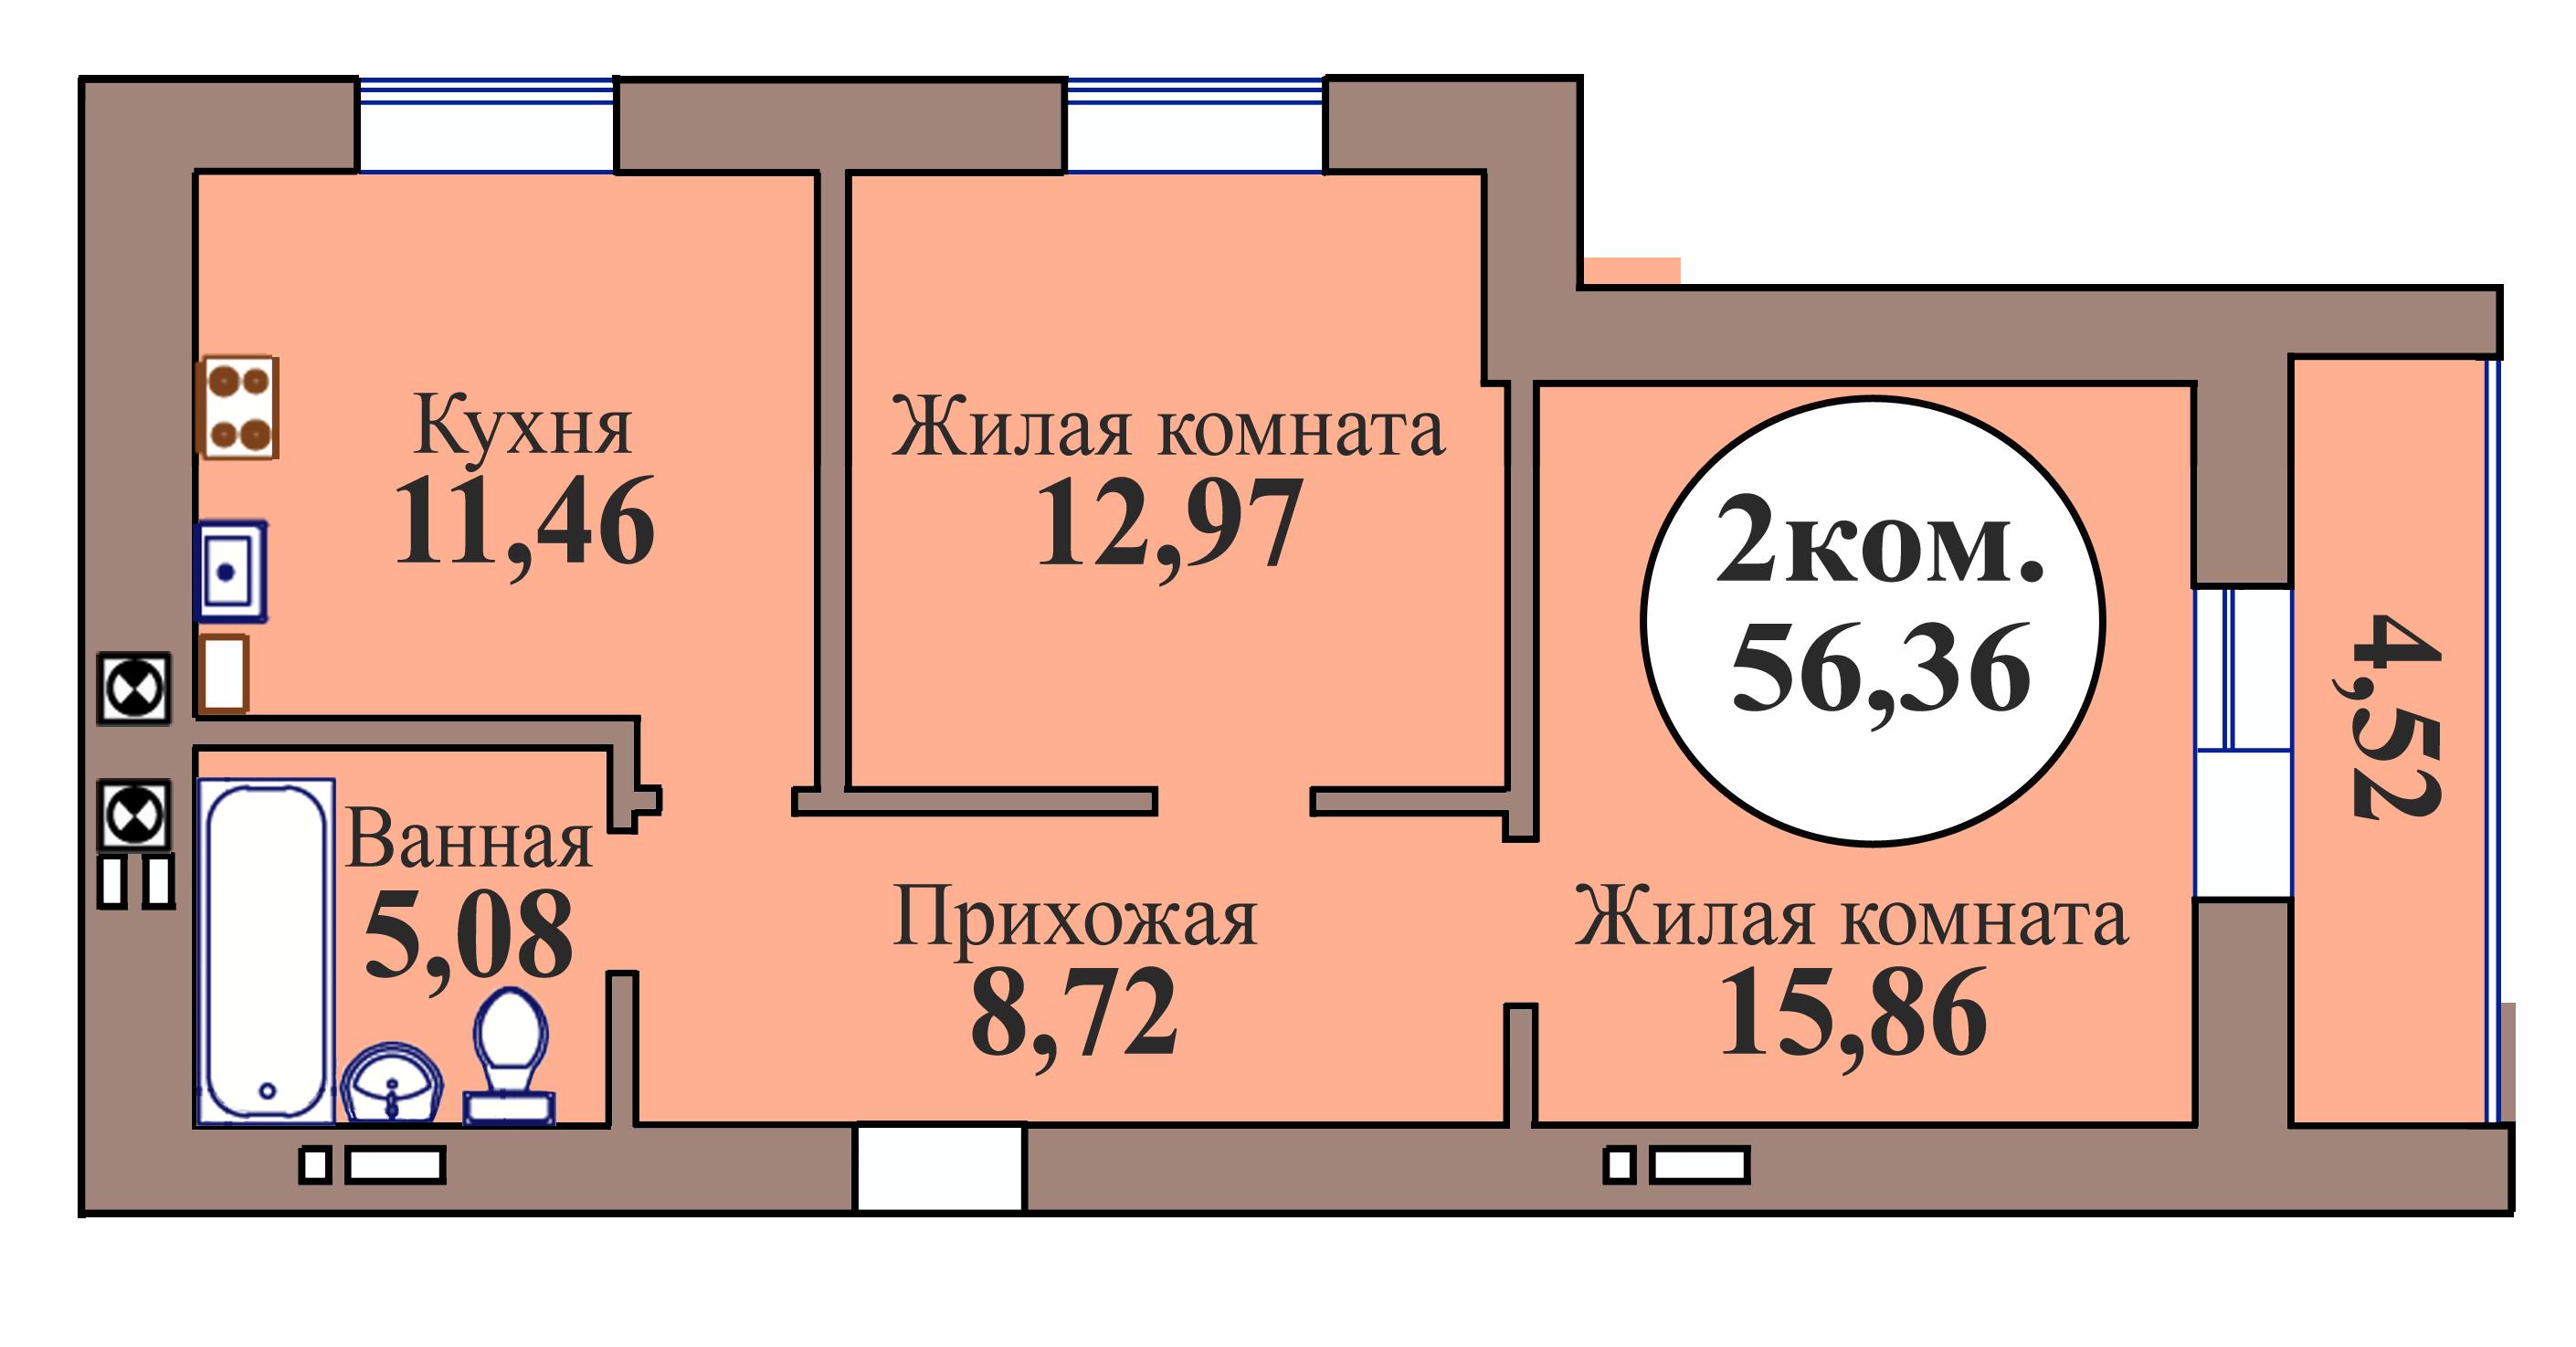 2-комн. кв. по пер. Калининградский, 5 кв. 110 в Калининграде